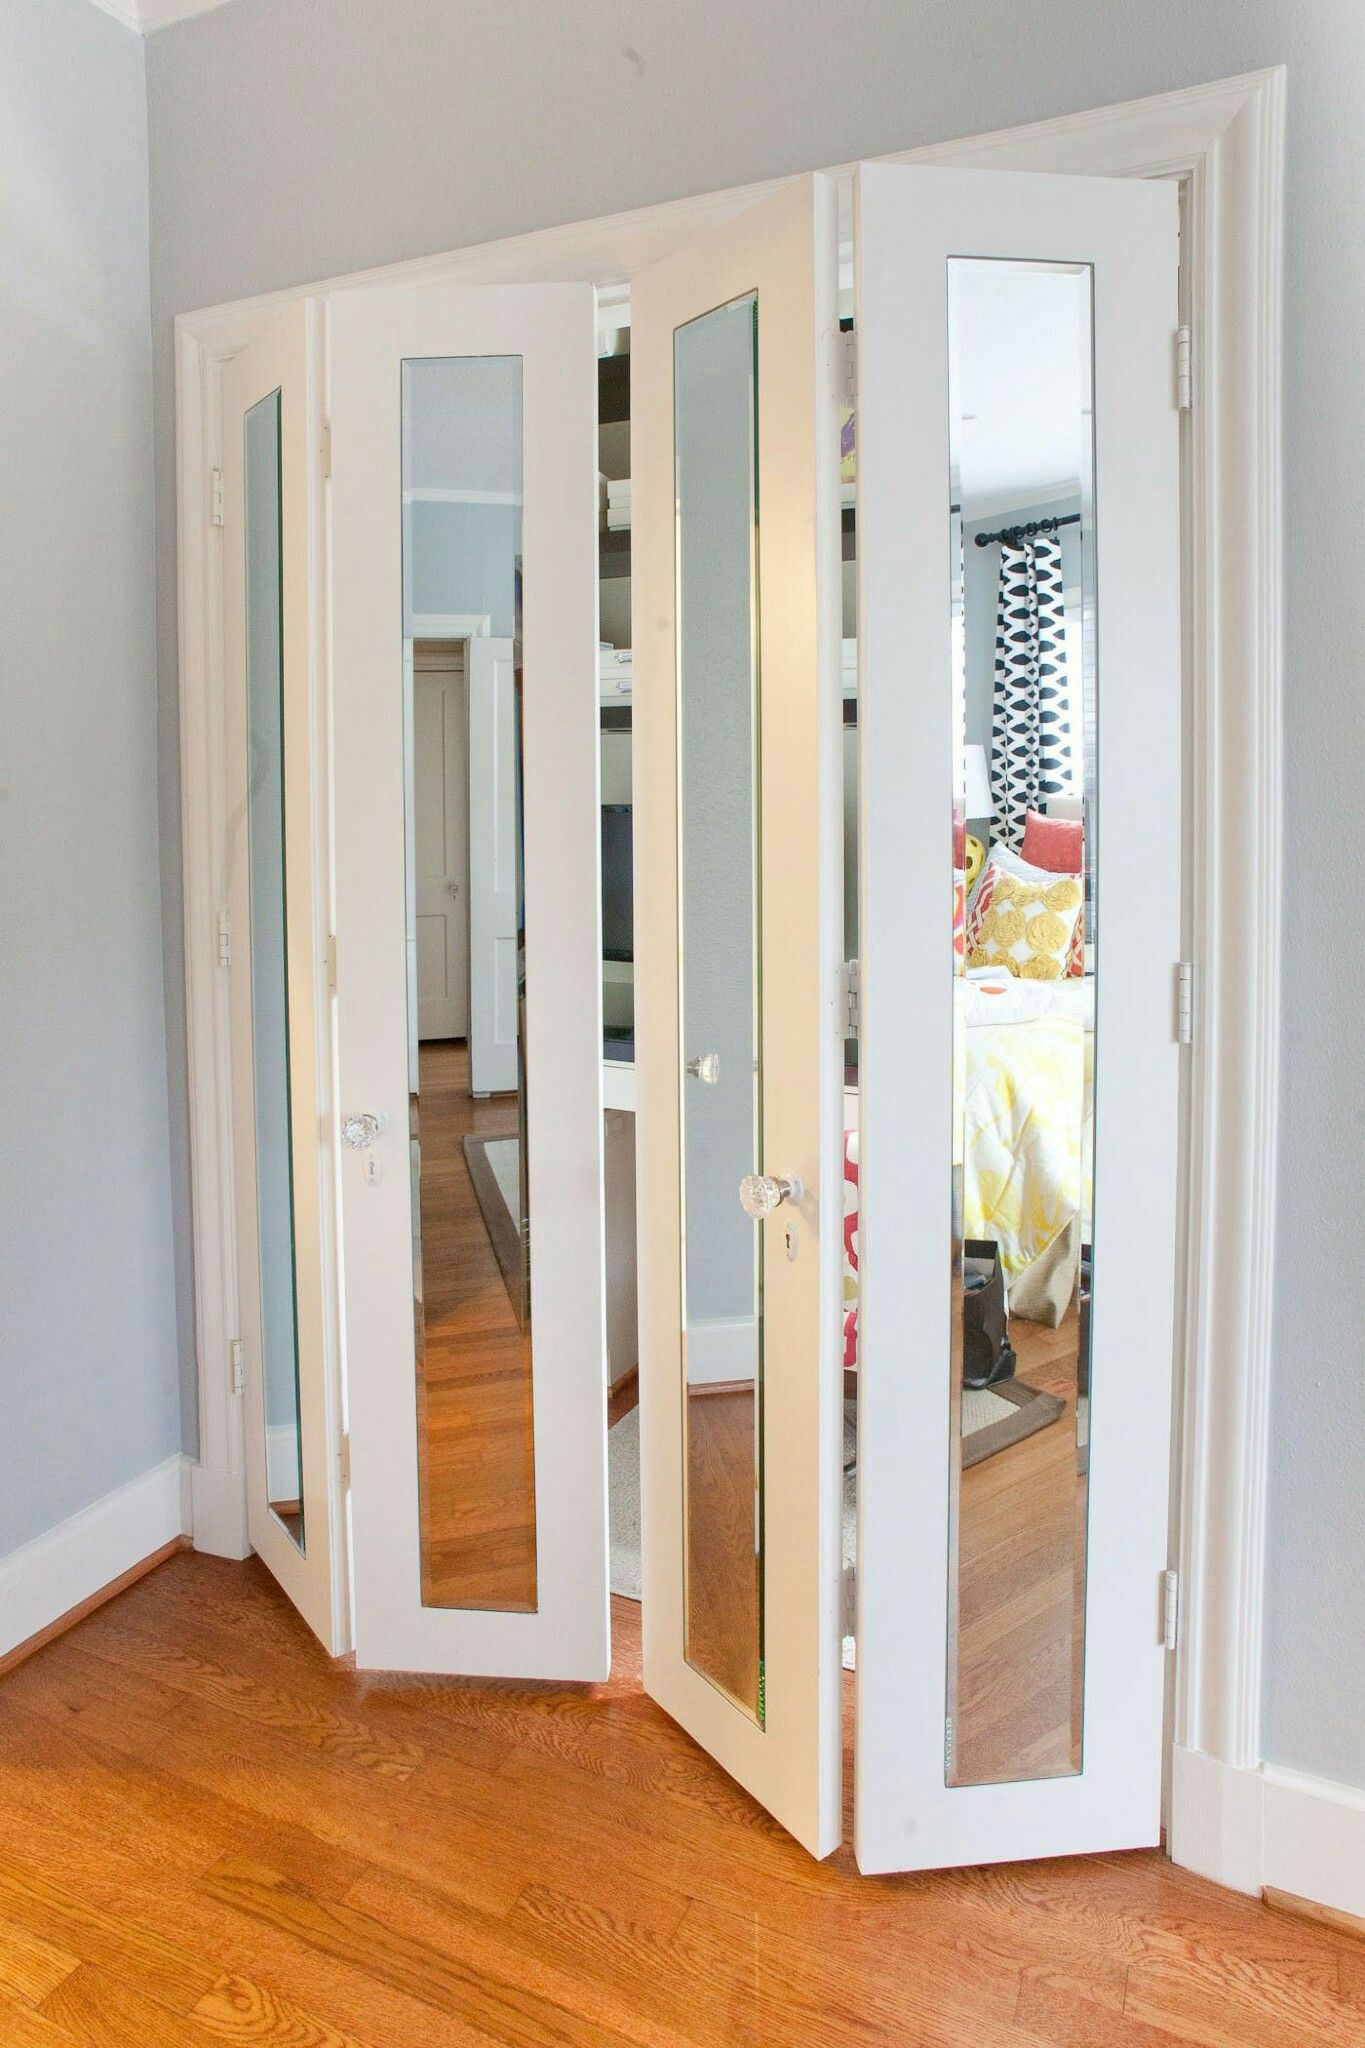 Updating old bifold closet doors   Home -- Inside -- Remodeling ...